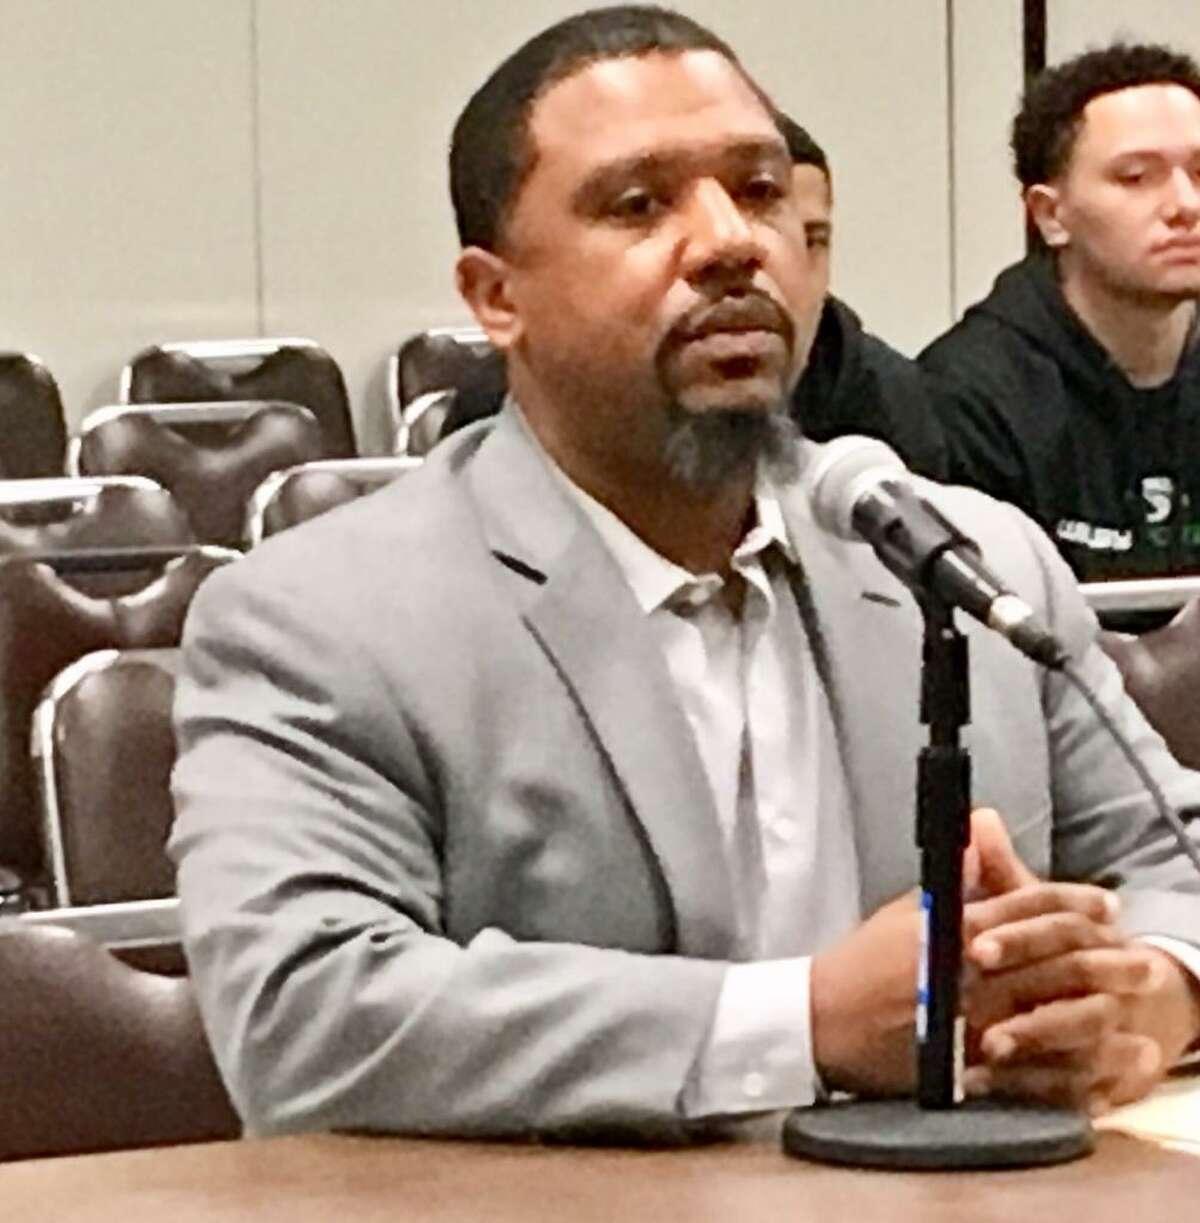 LaMar Kennedy is interviewed by Bridgeport Board of Education. April 22, 2019